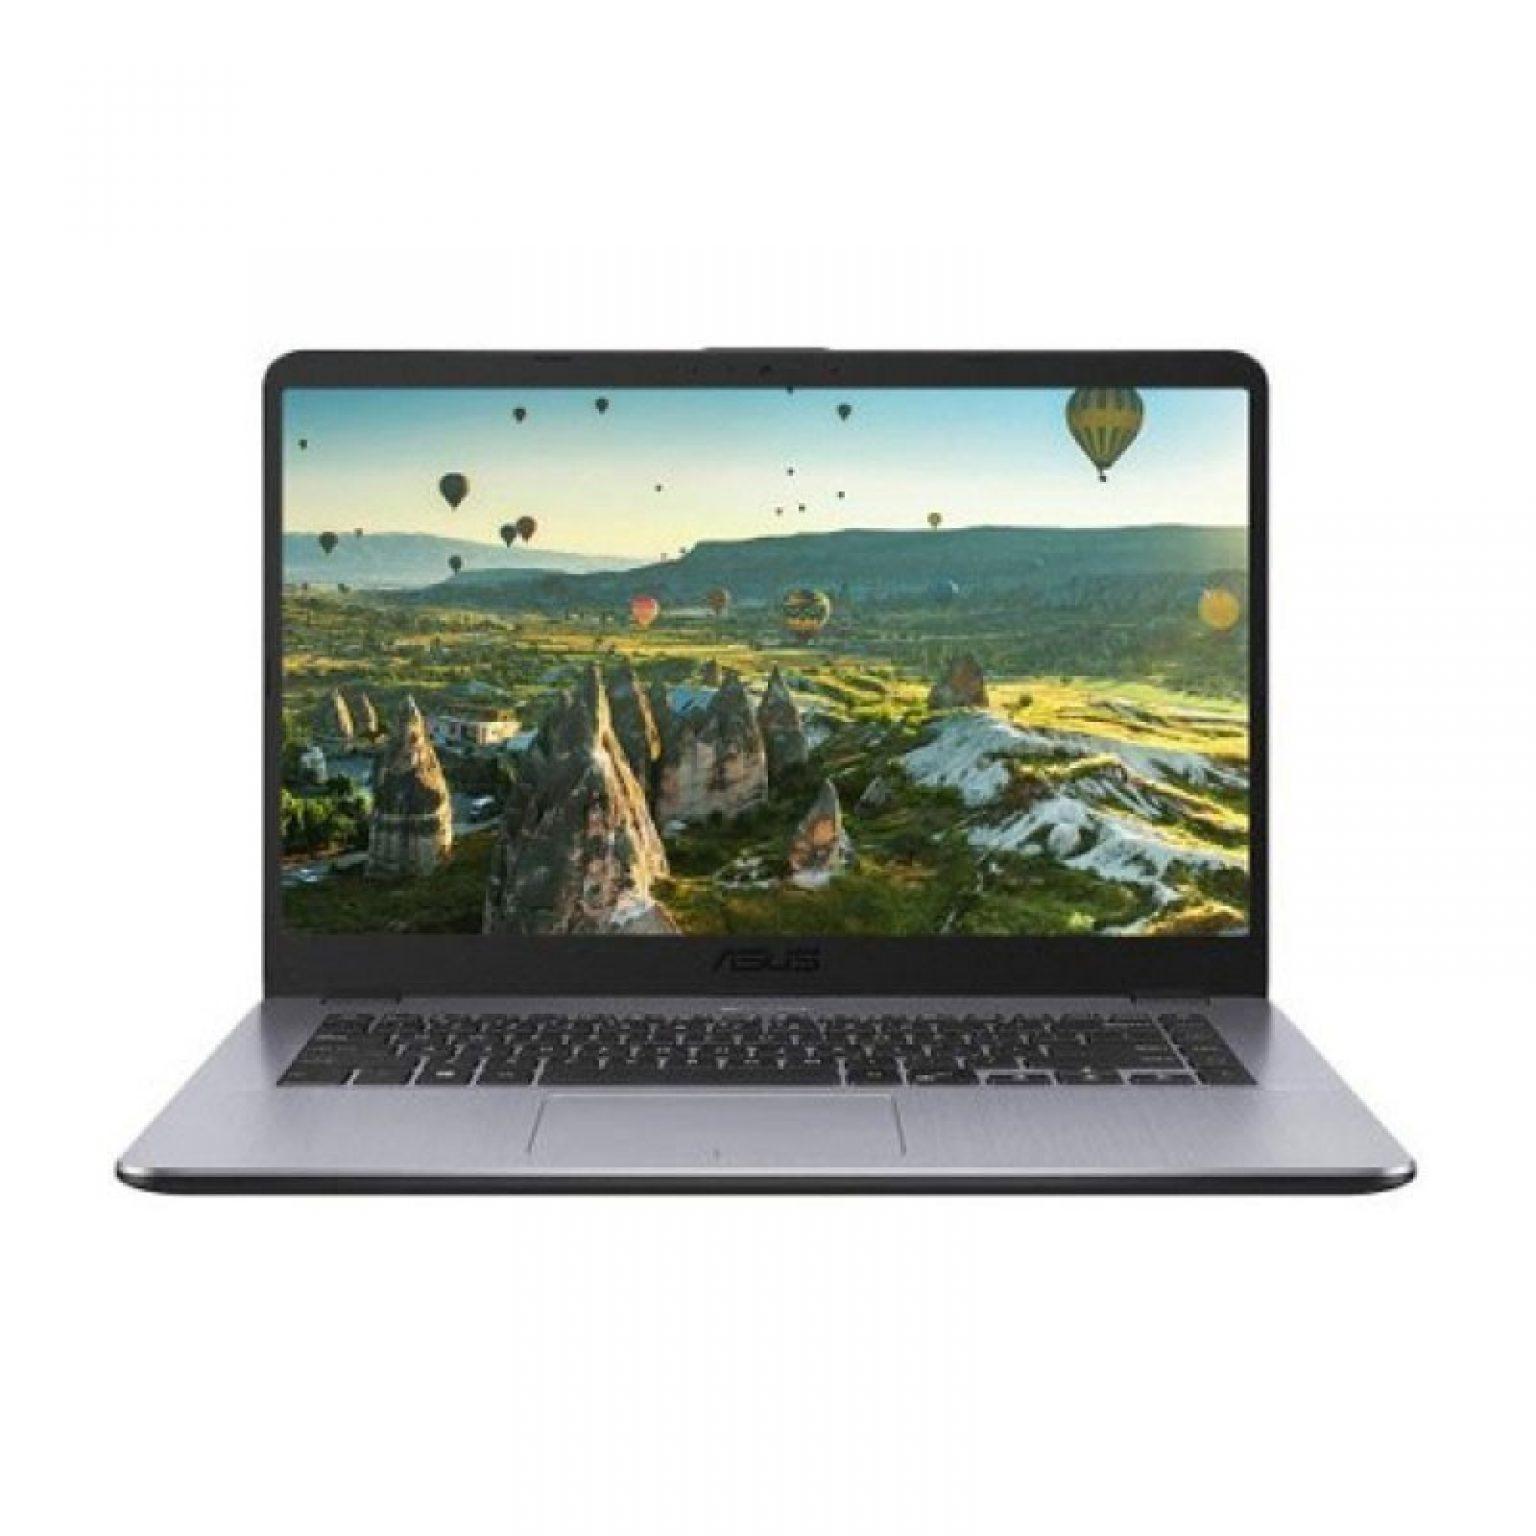 ASUS - X505ZA-BR511T (R5-2500U/8GB RAM/256GB/15.6inch/Win10SL/Dark Grey Metal)